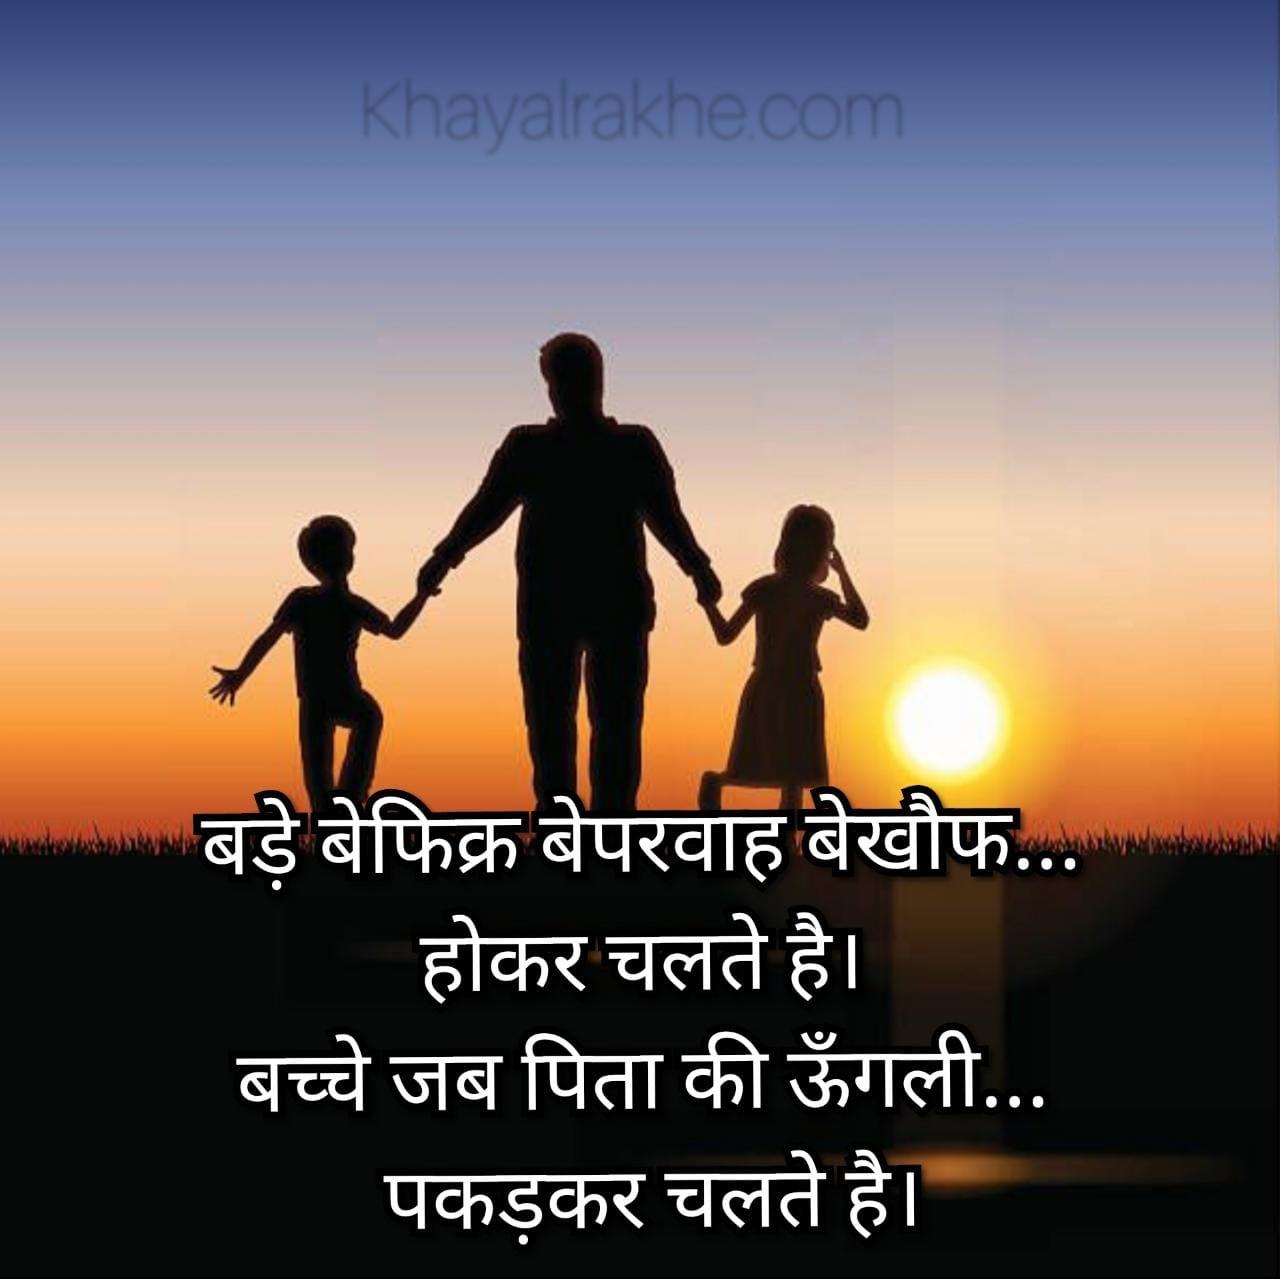 Emotional Father Quotes in Hindi - Shayari